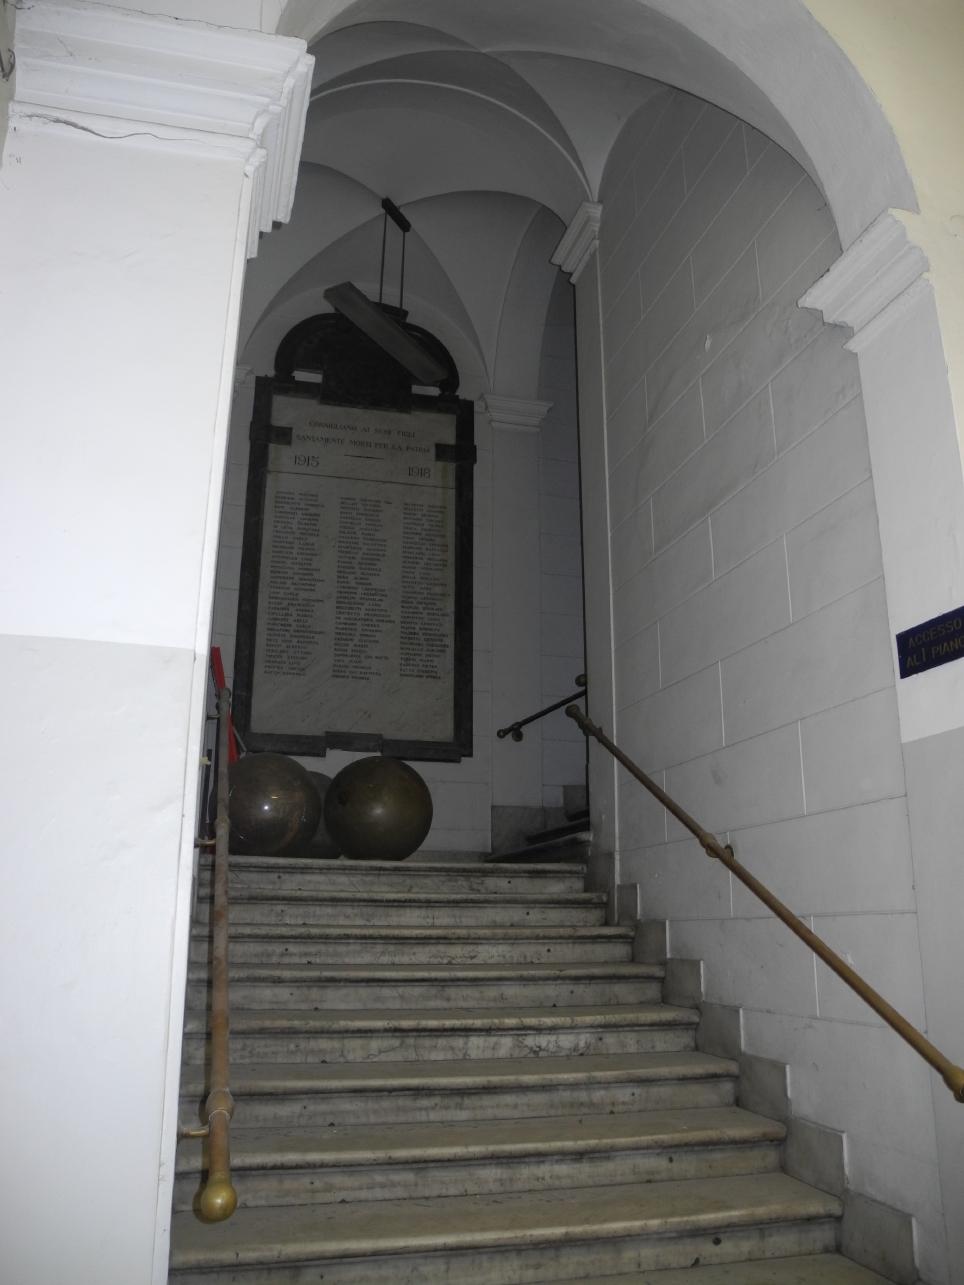 Villa Serra (villa, pubblica) - Genova (GE)